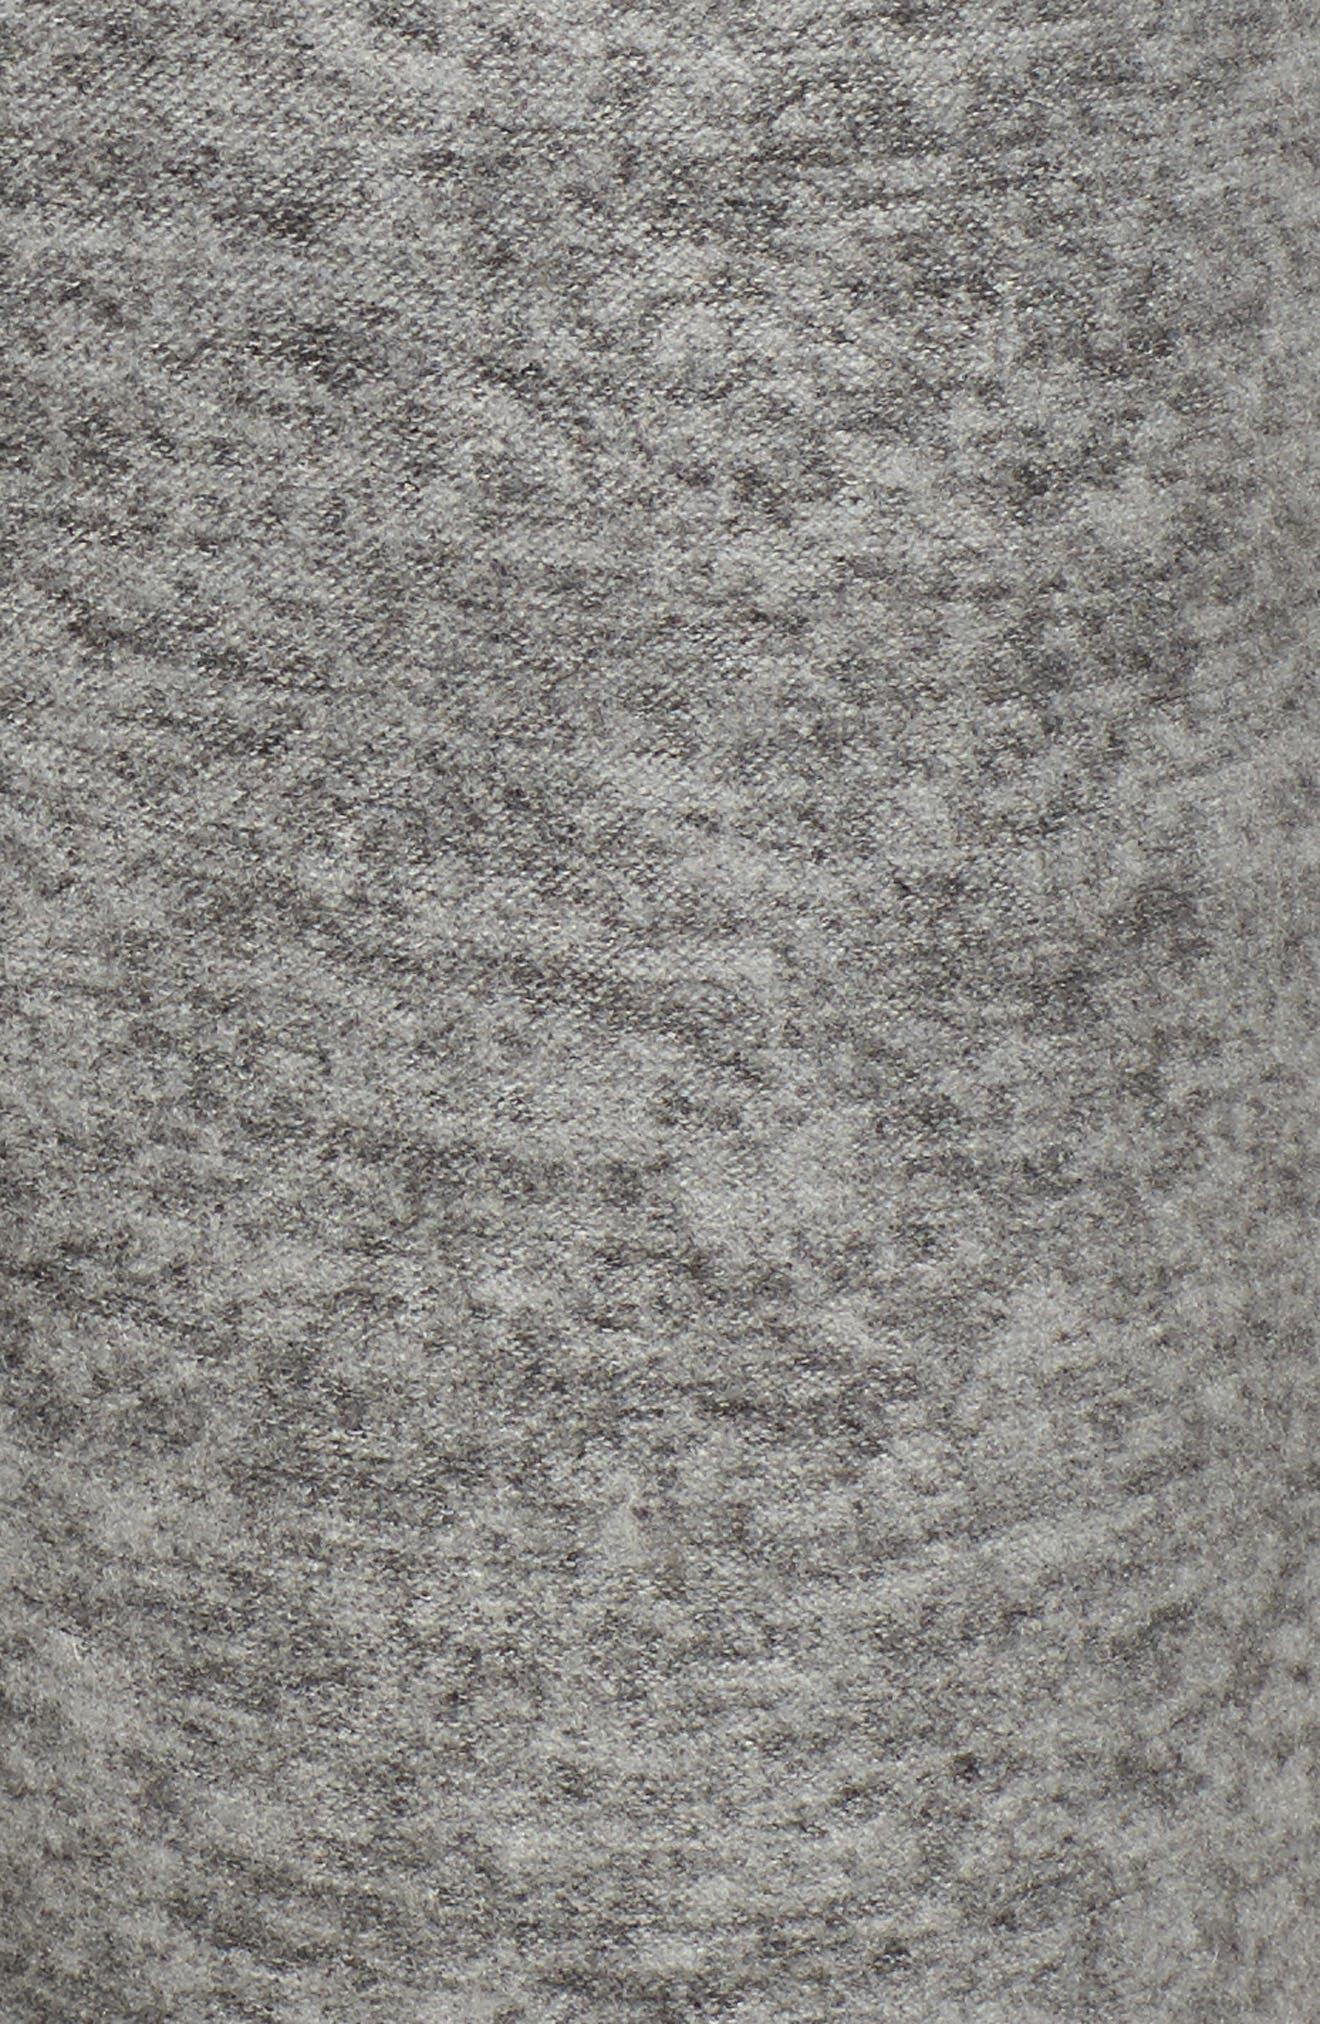 Mountain Air Pants,                             Alternate thumbnail 5, color,                             Heather Grey